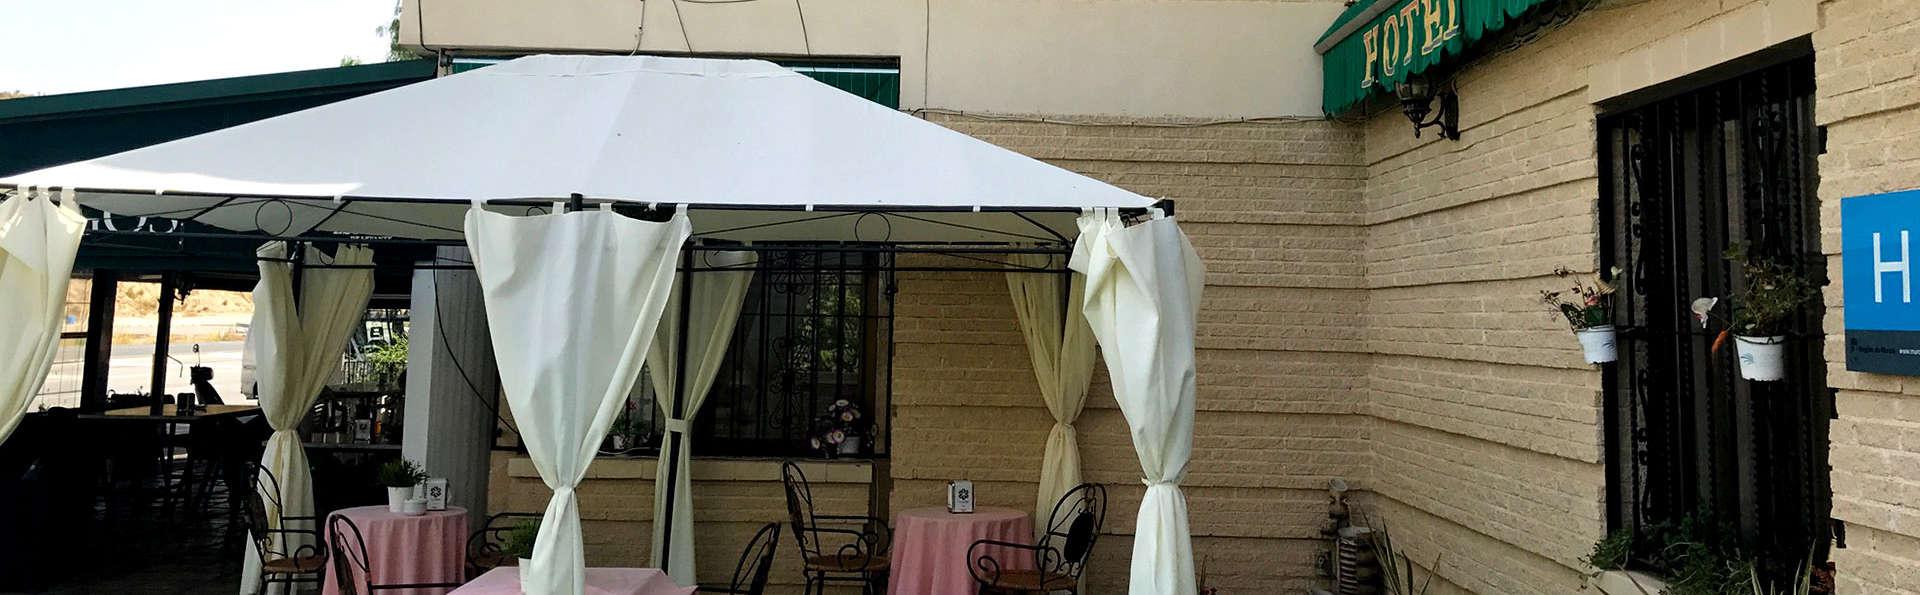 Hotel Argos Murcia - EDIT_NEW2_TERRACE.jpg